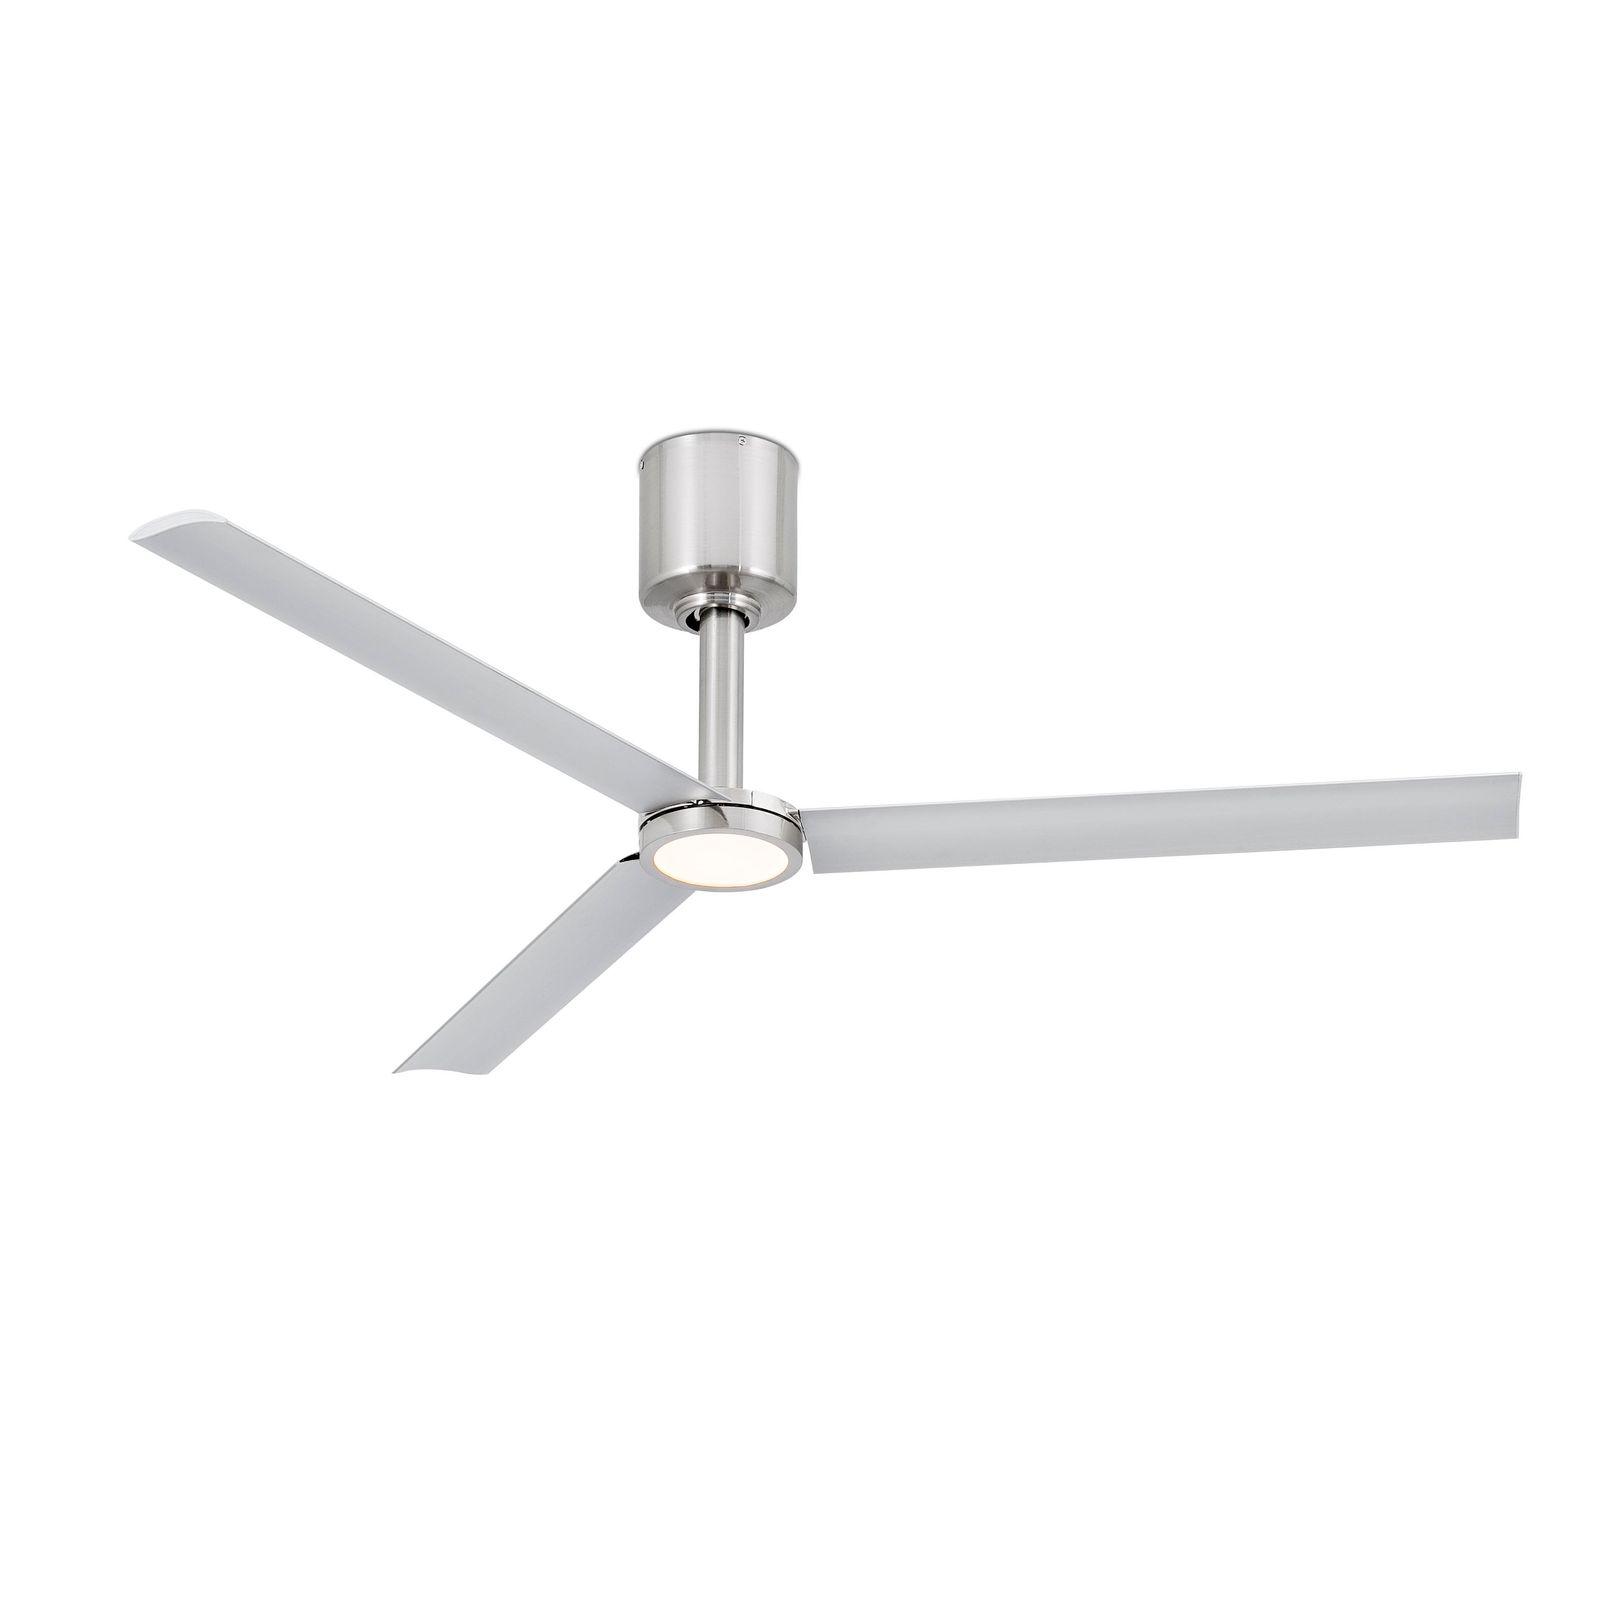 Faro energy saving LED ceiling fan Tao Nickel matt 132cm 52